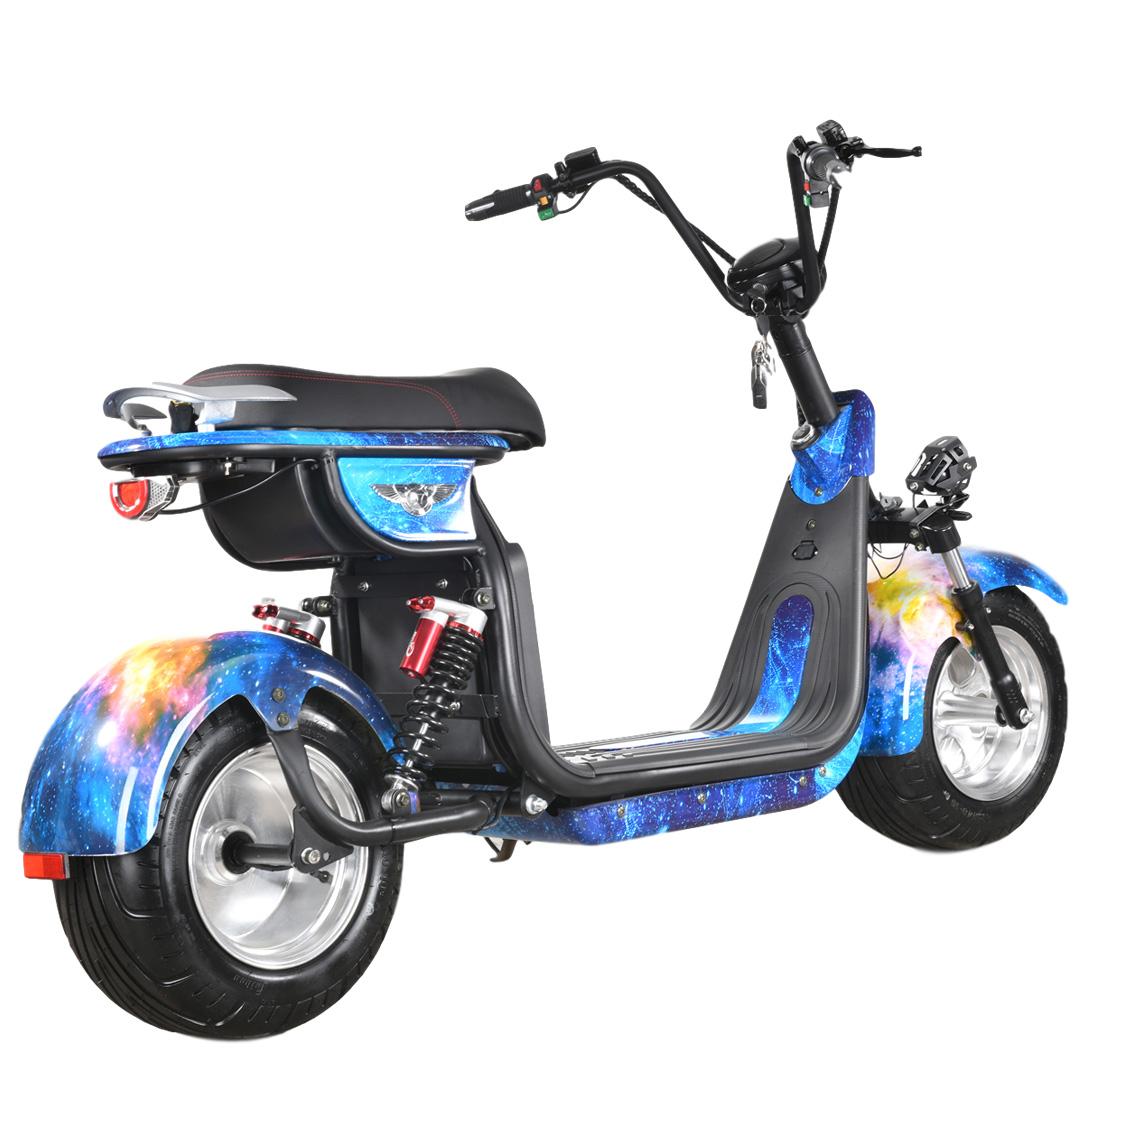 Гоночный мотоцикл Yidegreen Scooter SF001